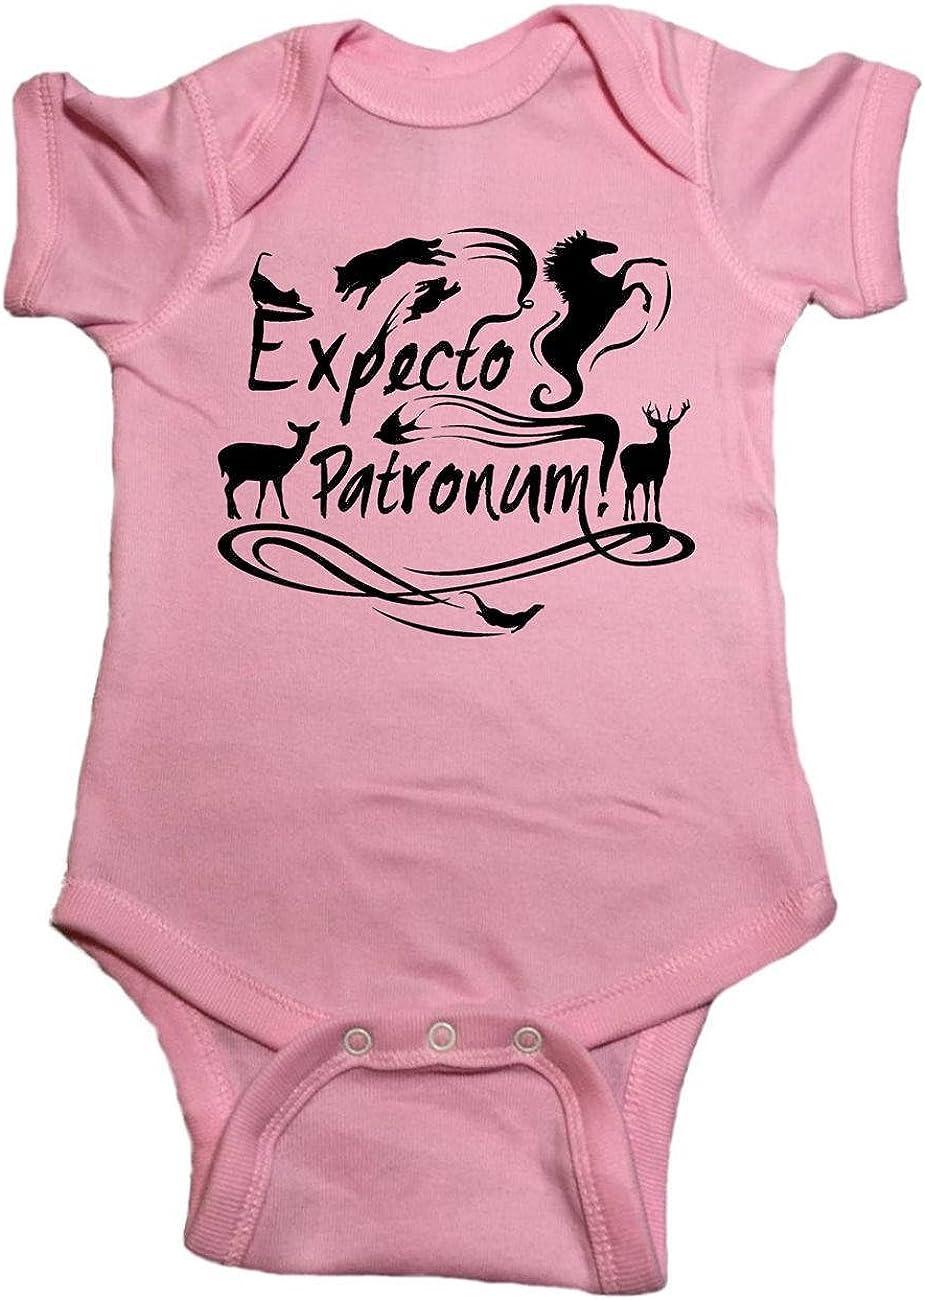 Baby One Peice Animal Bodysuit